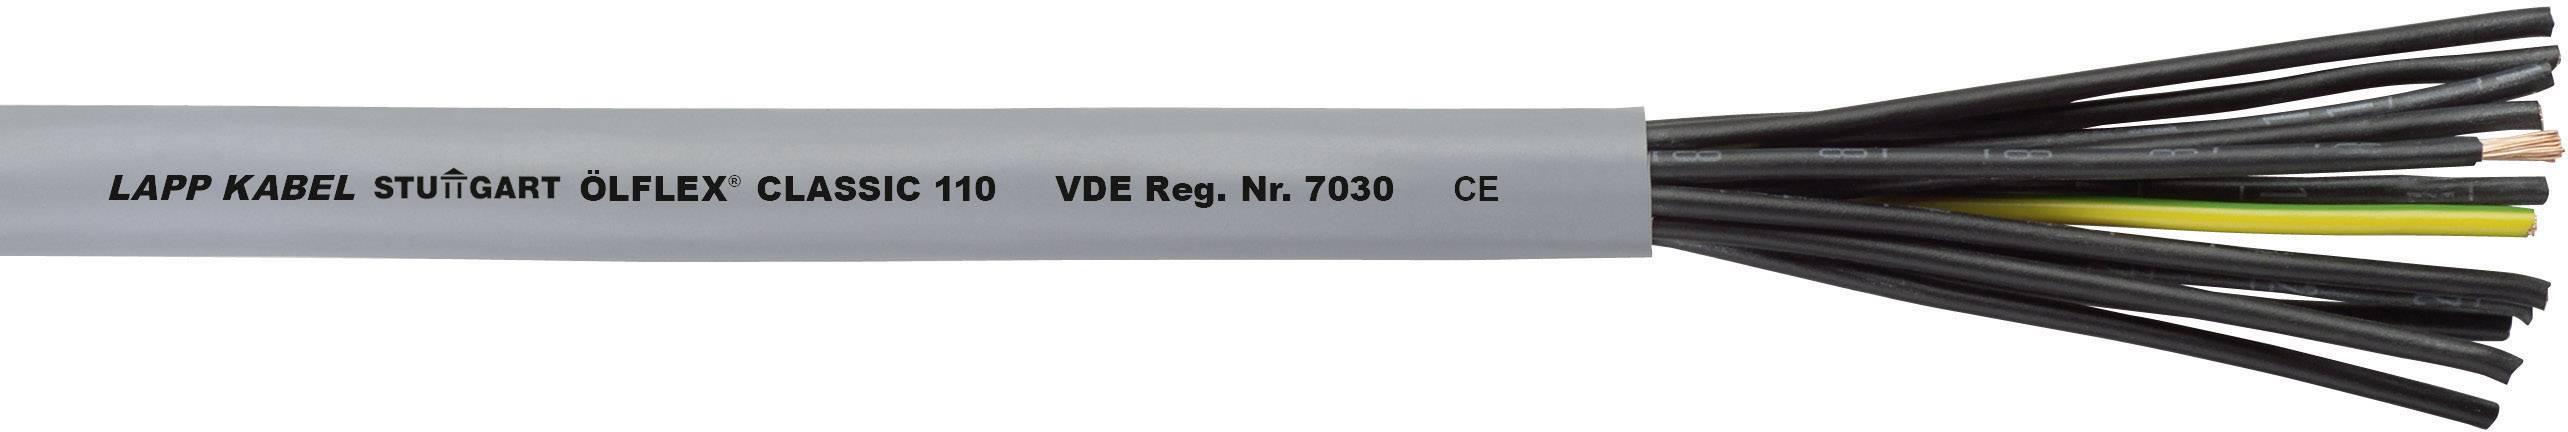 Datový kabel LappKabel Ölflex CLASSIC 110, 18 x 0,75 mm², šedá, 1 m